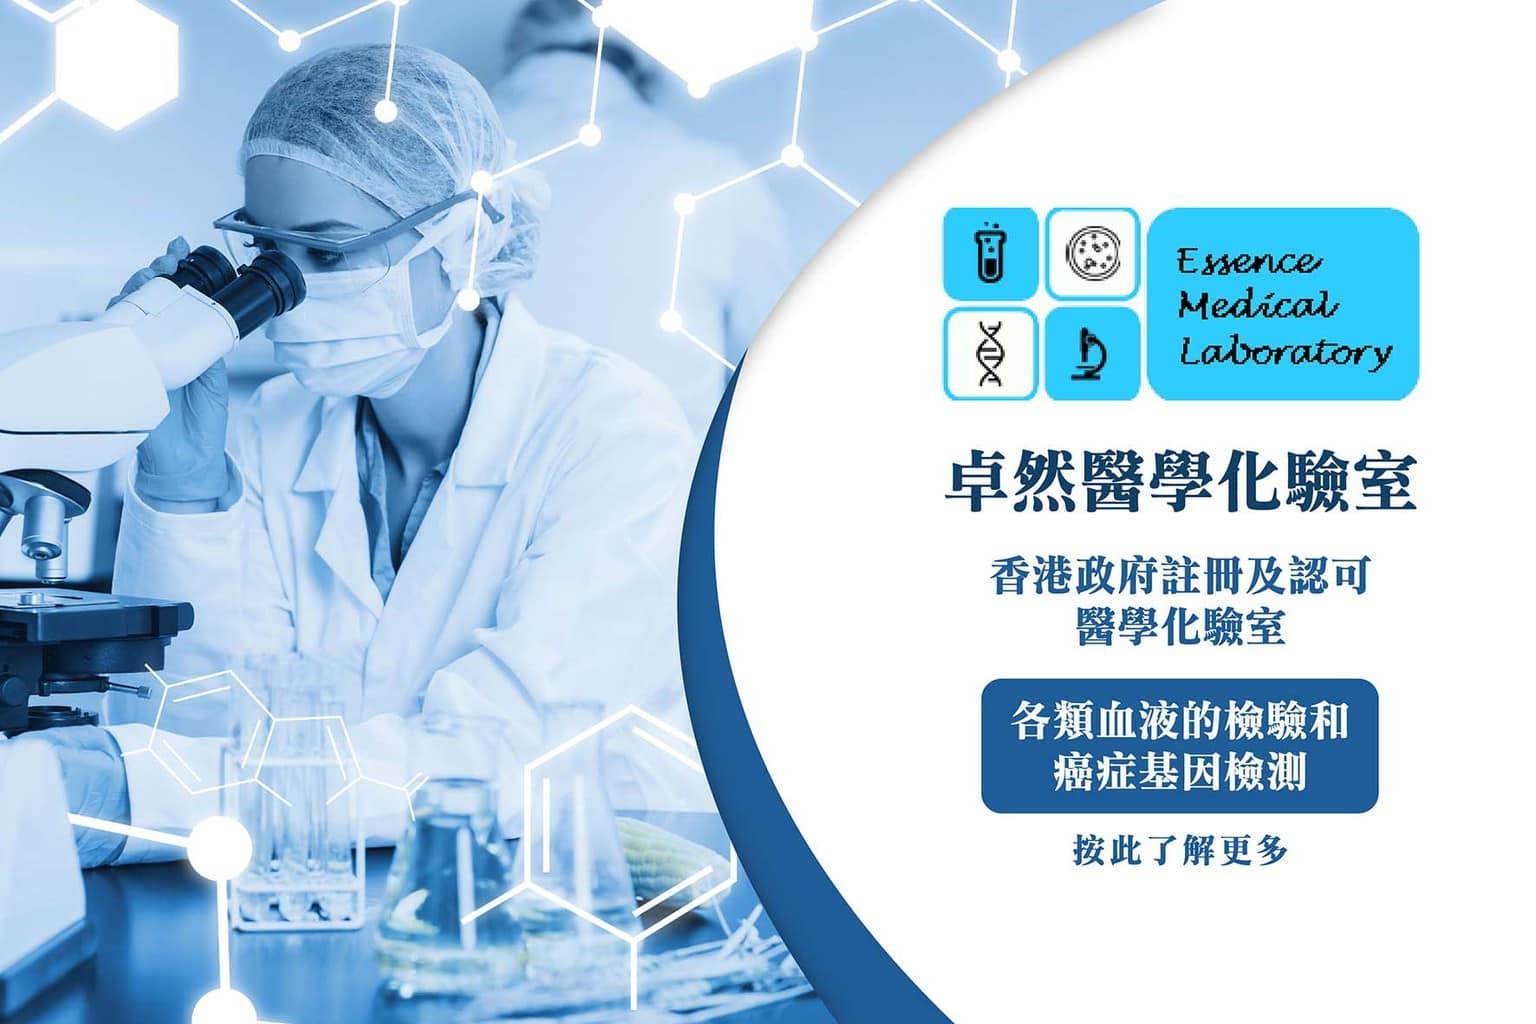 Essence Medical Laboratory 卓然醫學化驗室 腫瘤 癌症